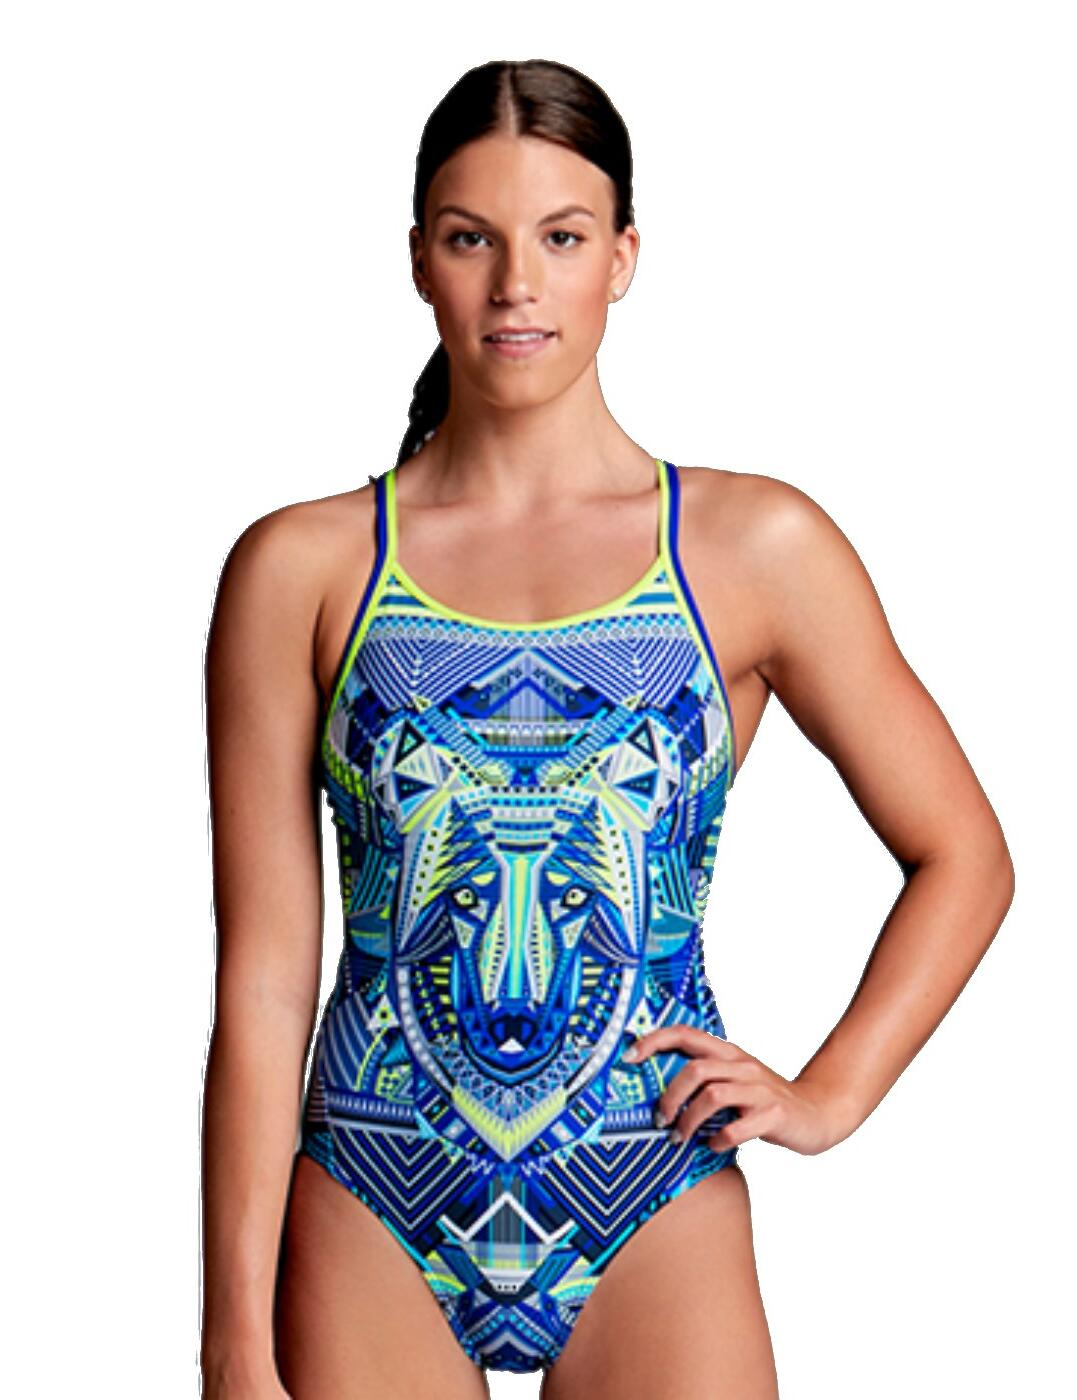 f59a85108f75b Funkita Ladies Sea Wolf Diamond Back One Piece Swimsuit - Belle Lingerie